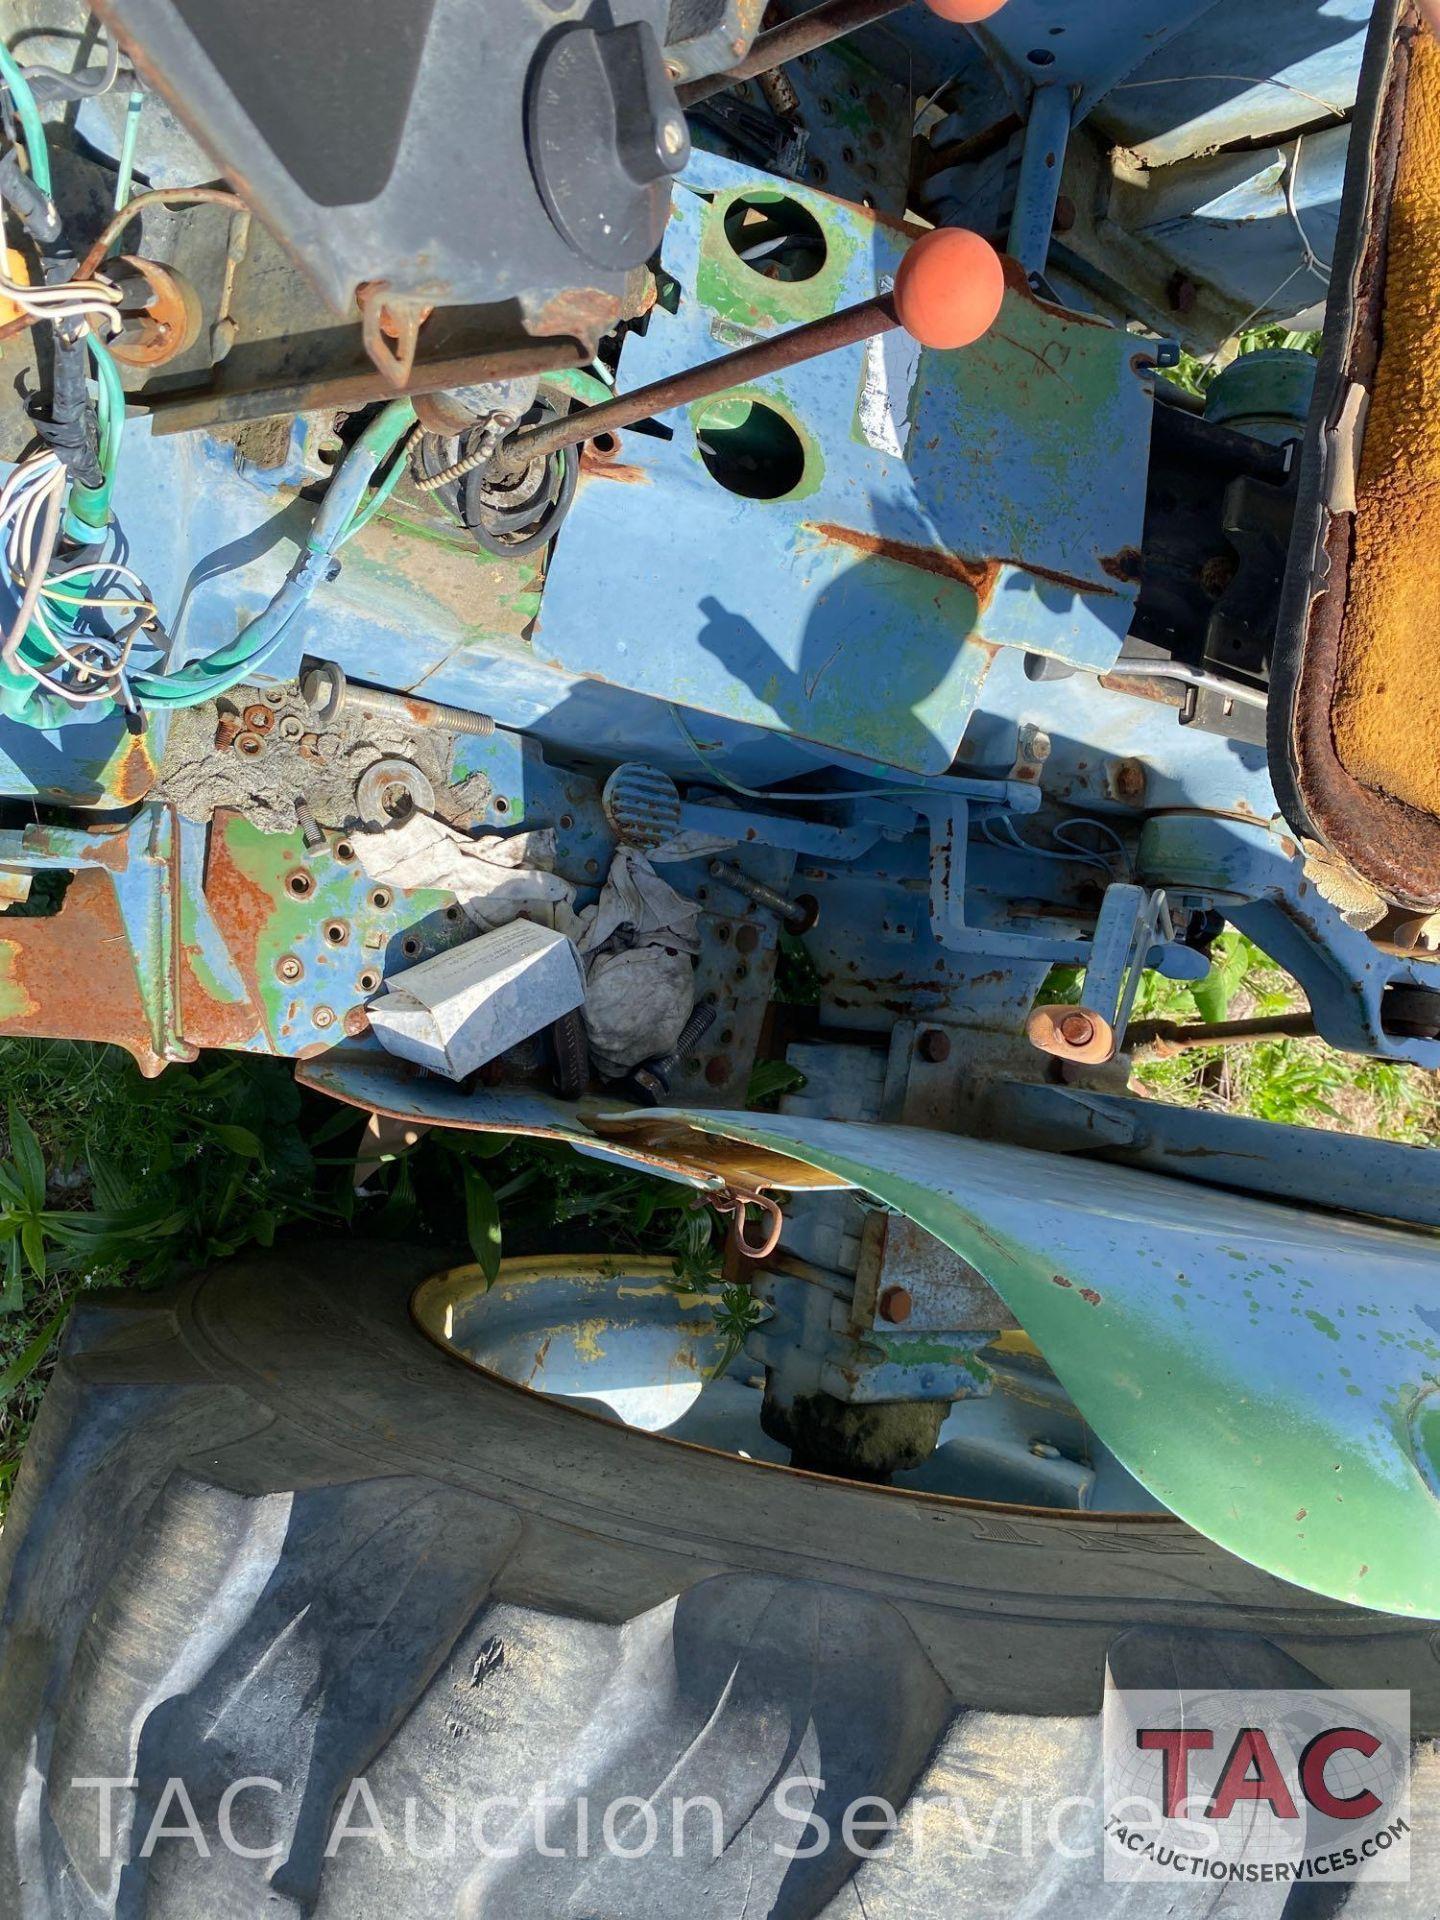 John Deere 2150 Farm Tractor - Image 16 of 34